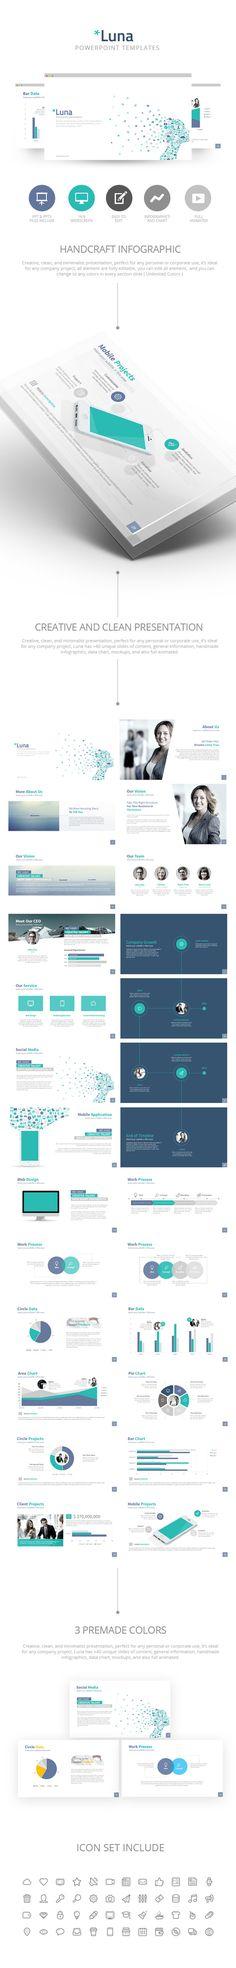 Havana PowerPoint Presentation Backgrounds, Presentation templates